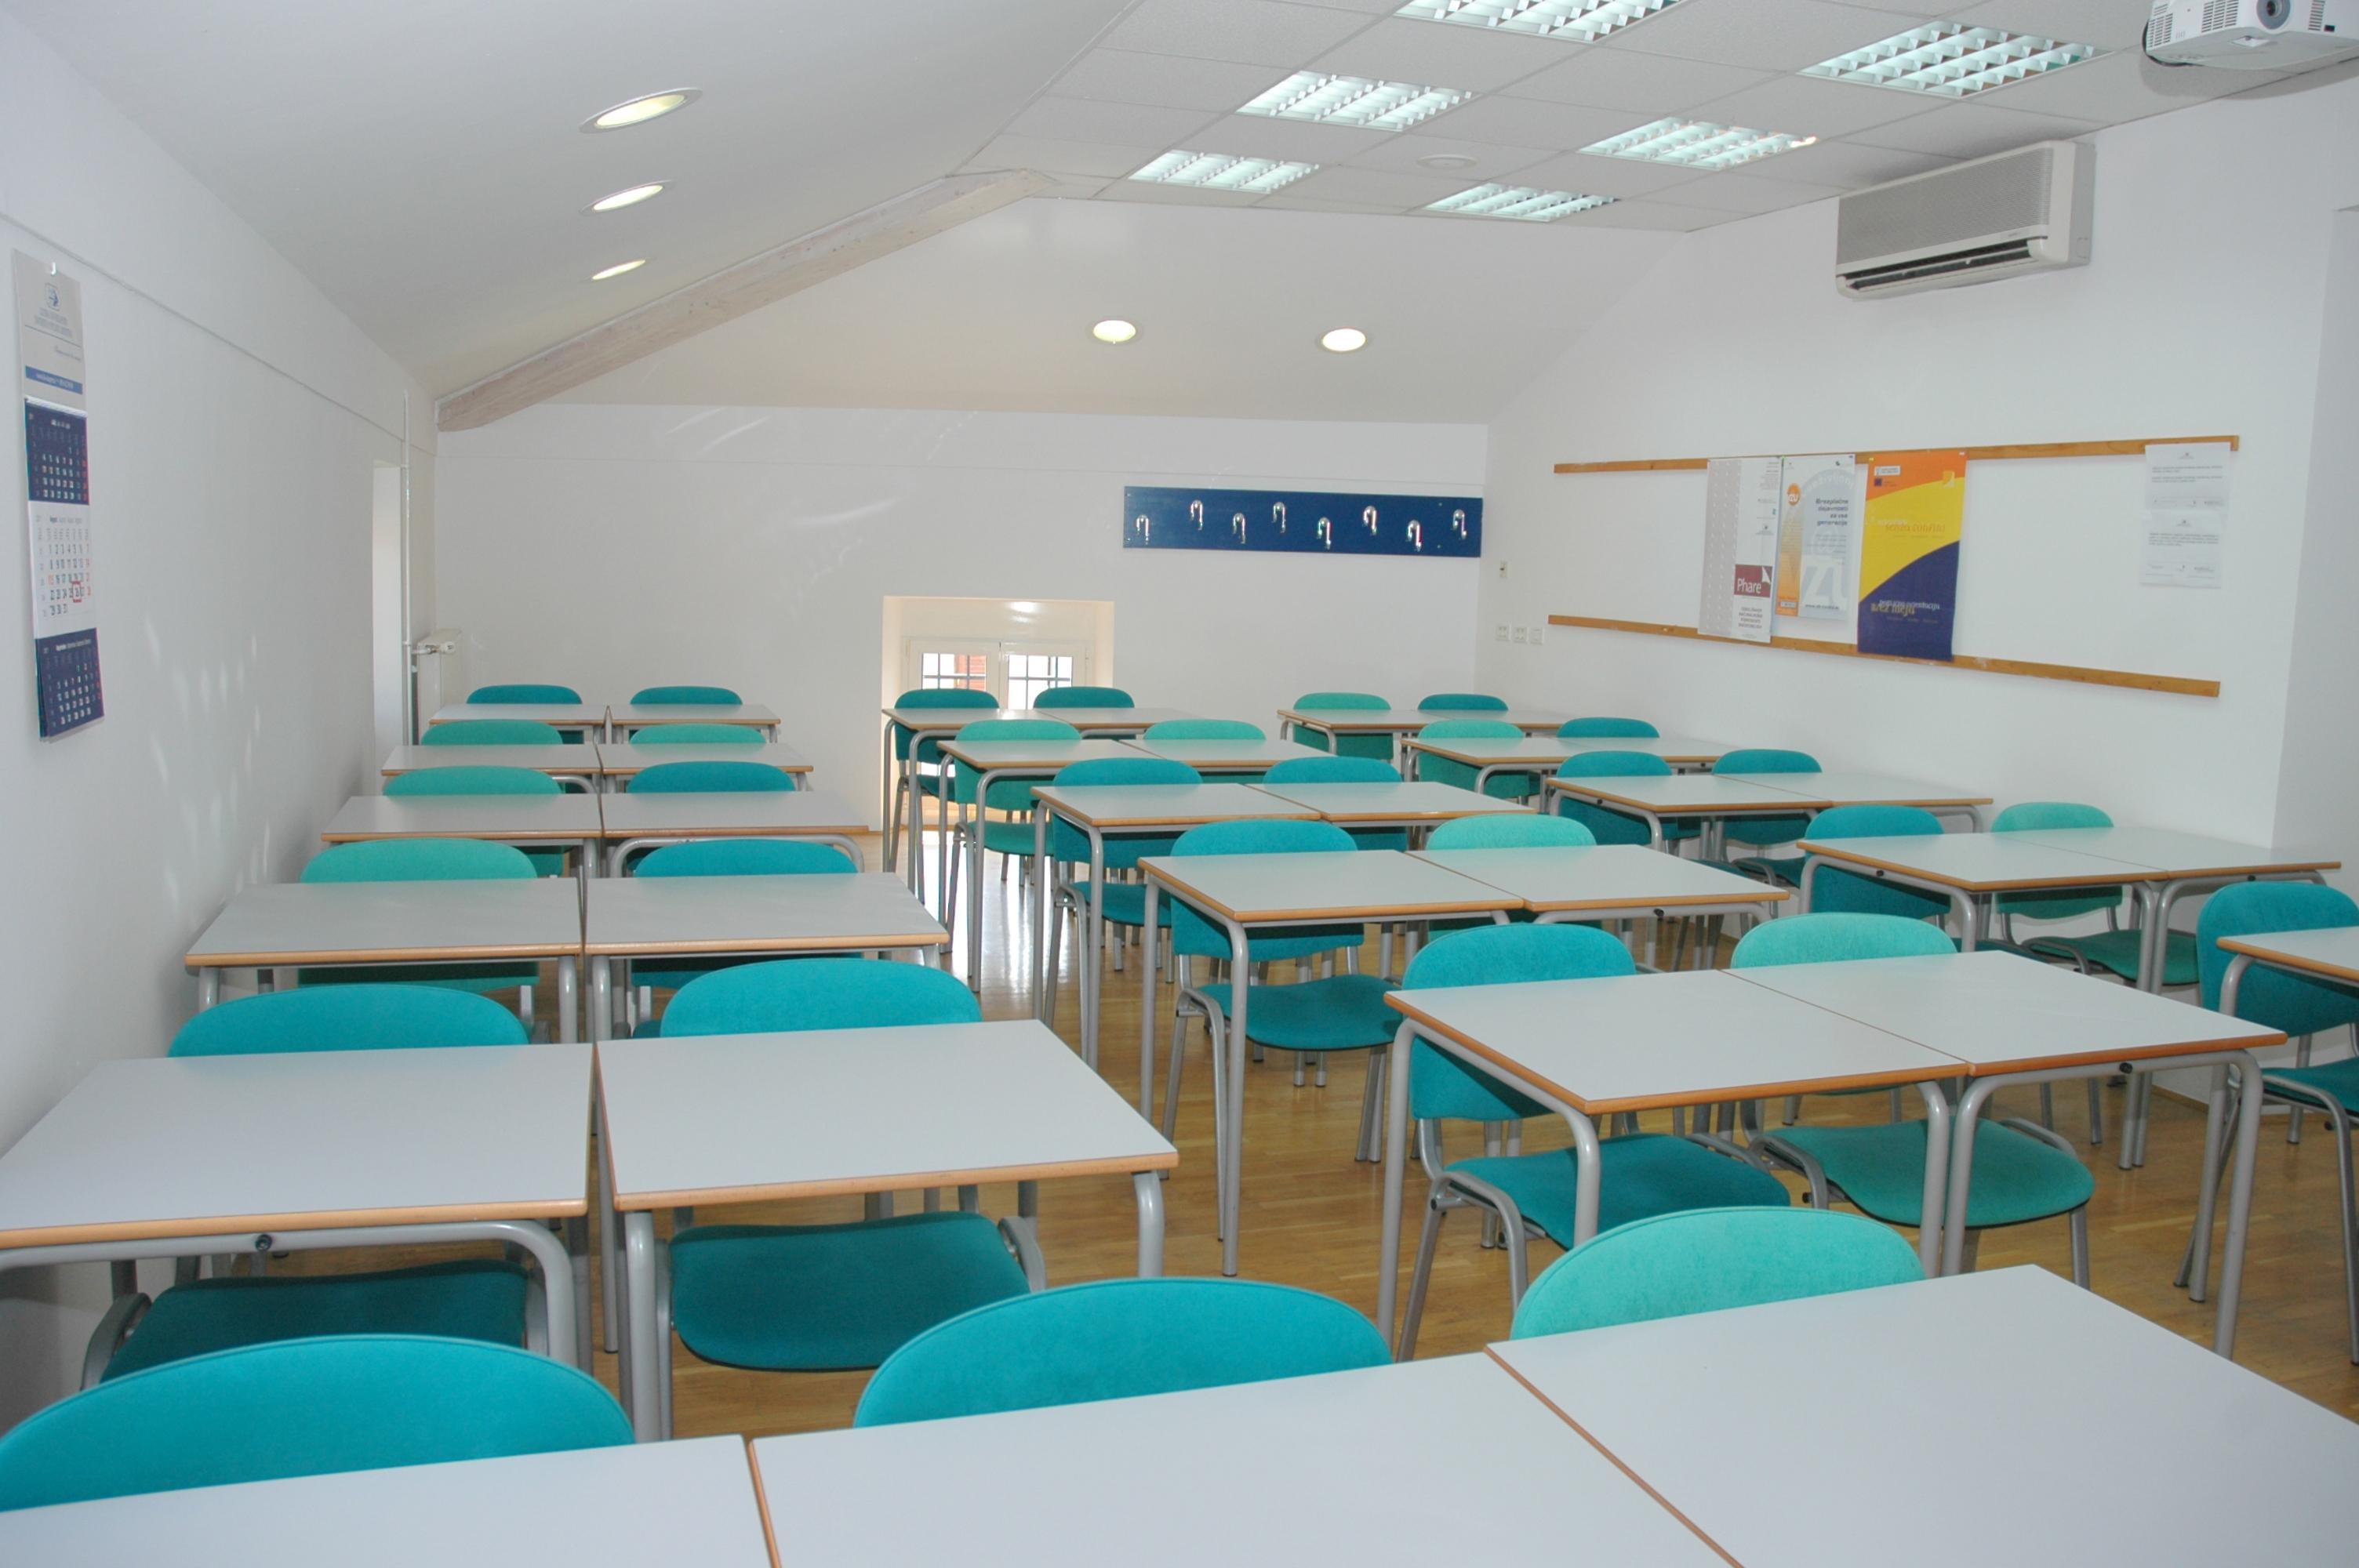 velika učilnica